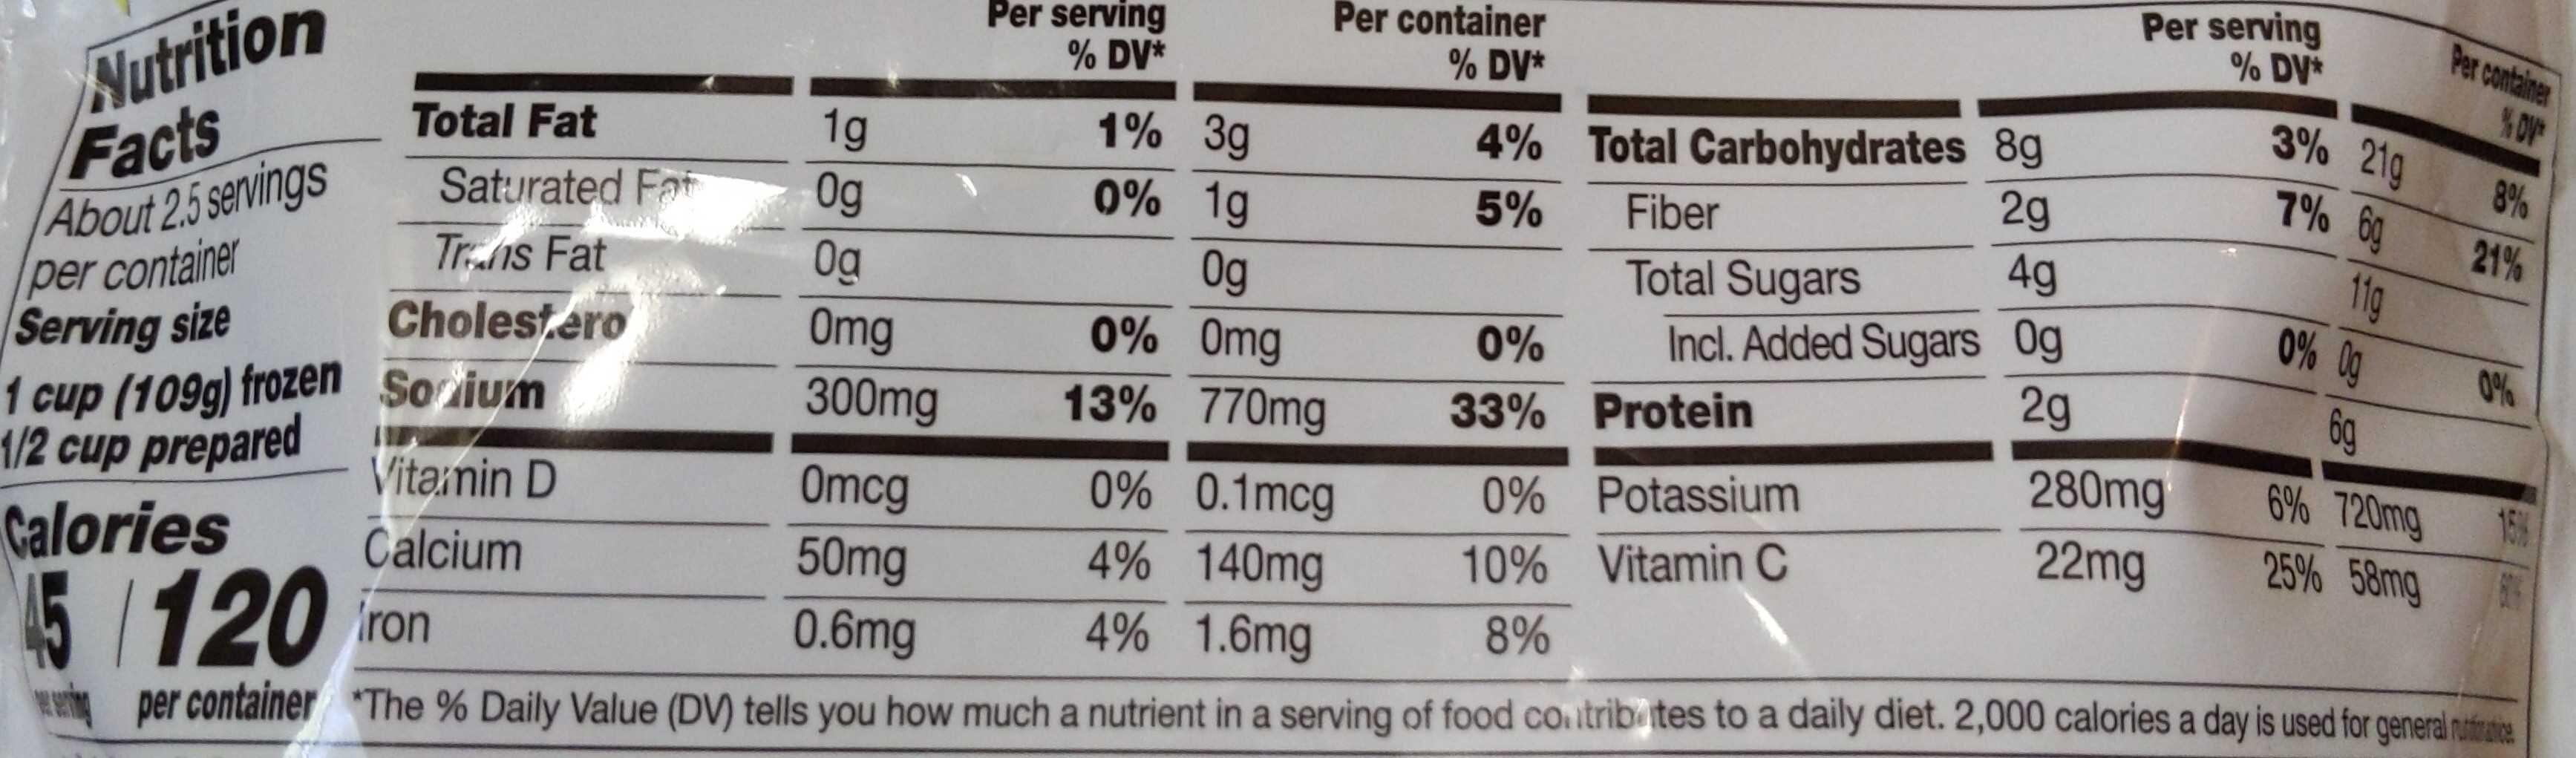 Simply Steam Broccoli, Carrots, Cauliflower & Cheese Sauce - Nutrition facts - en